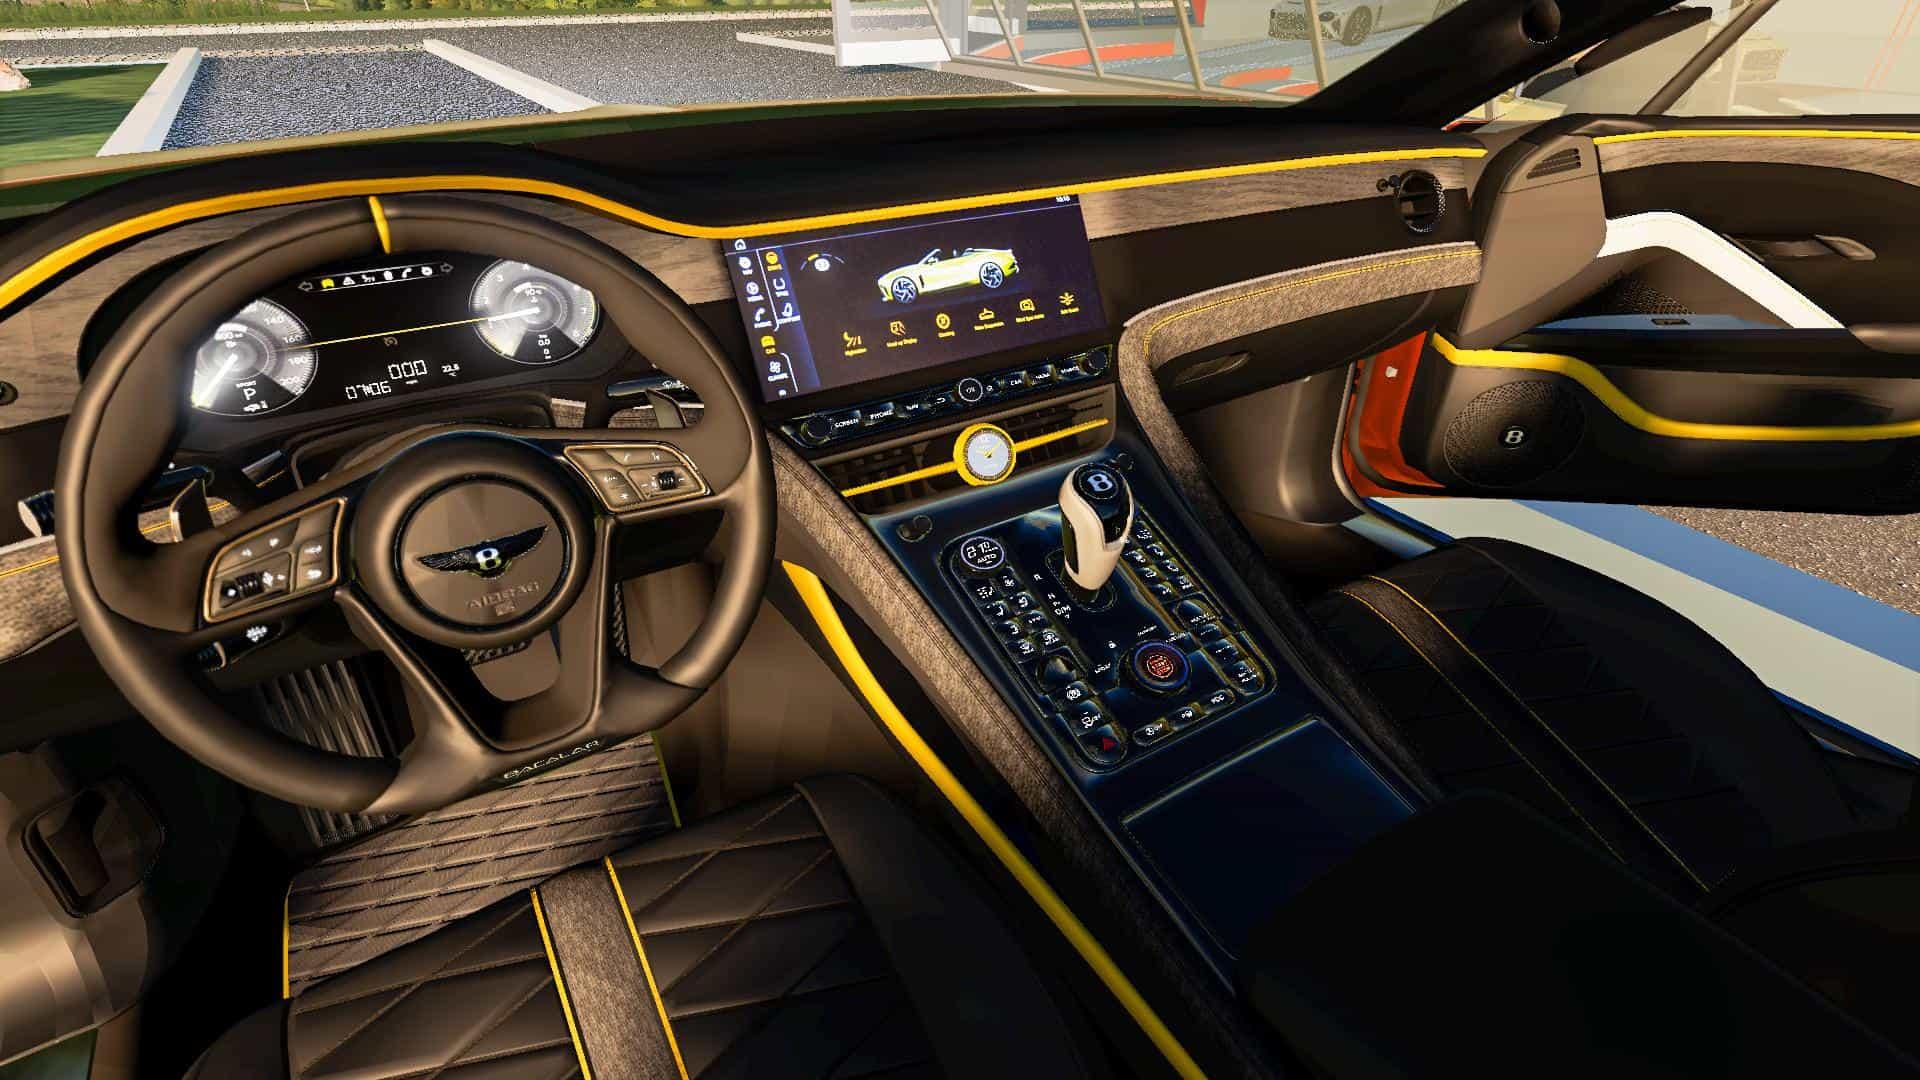 Bentley Mulliner Bacalar 2021 V1 0 0 0 Mod Farming Simulator 19 Cars Mod